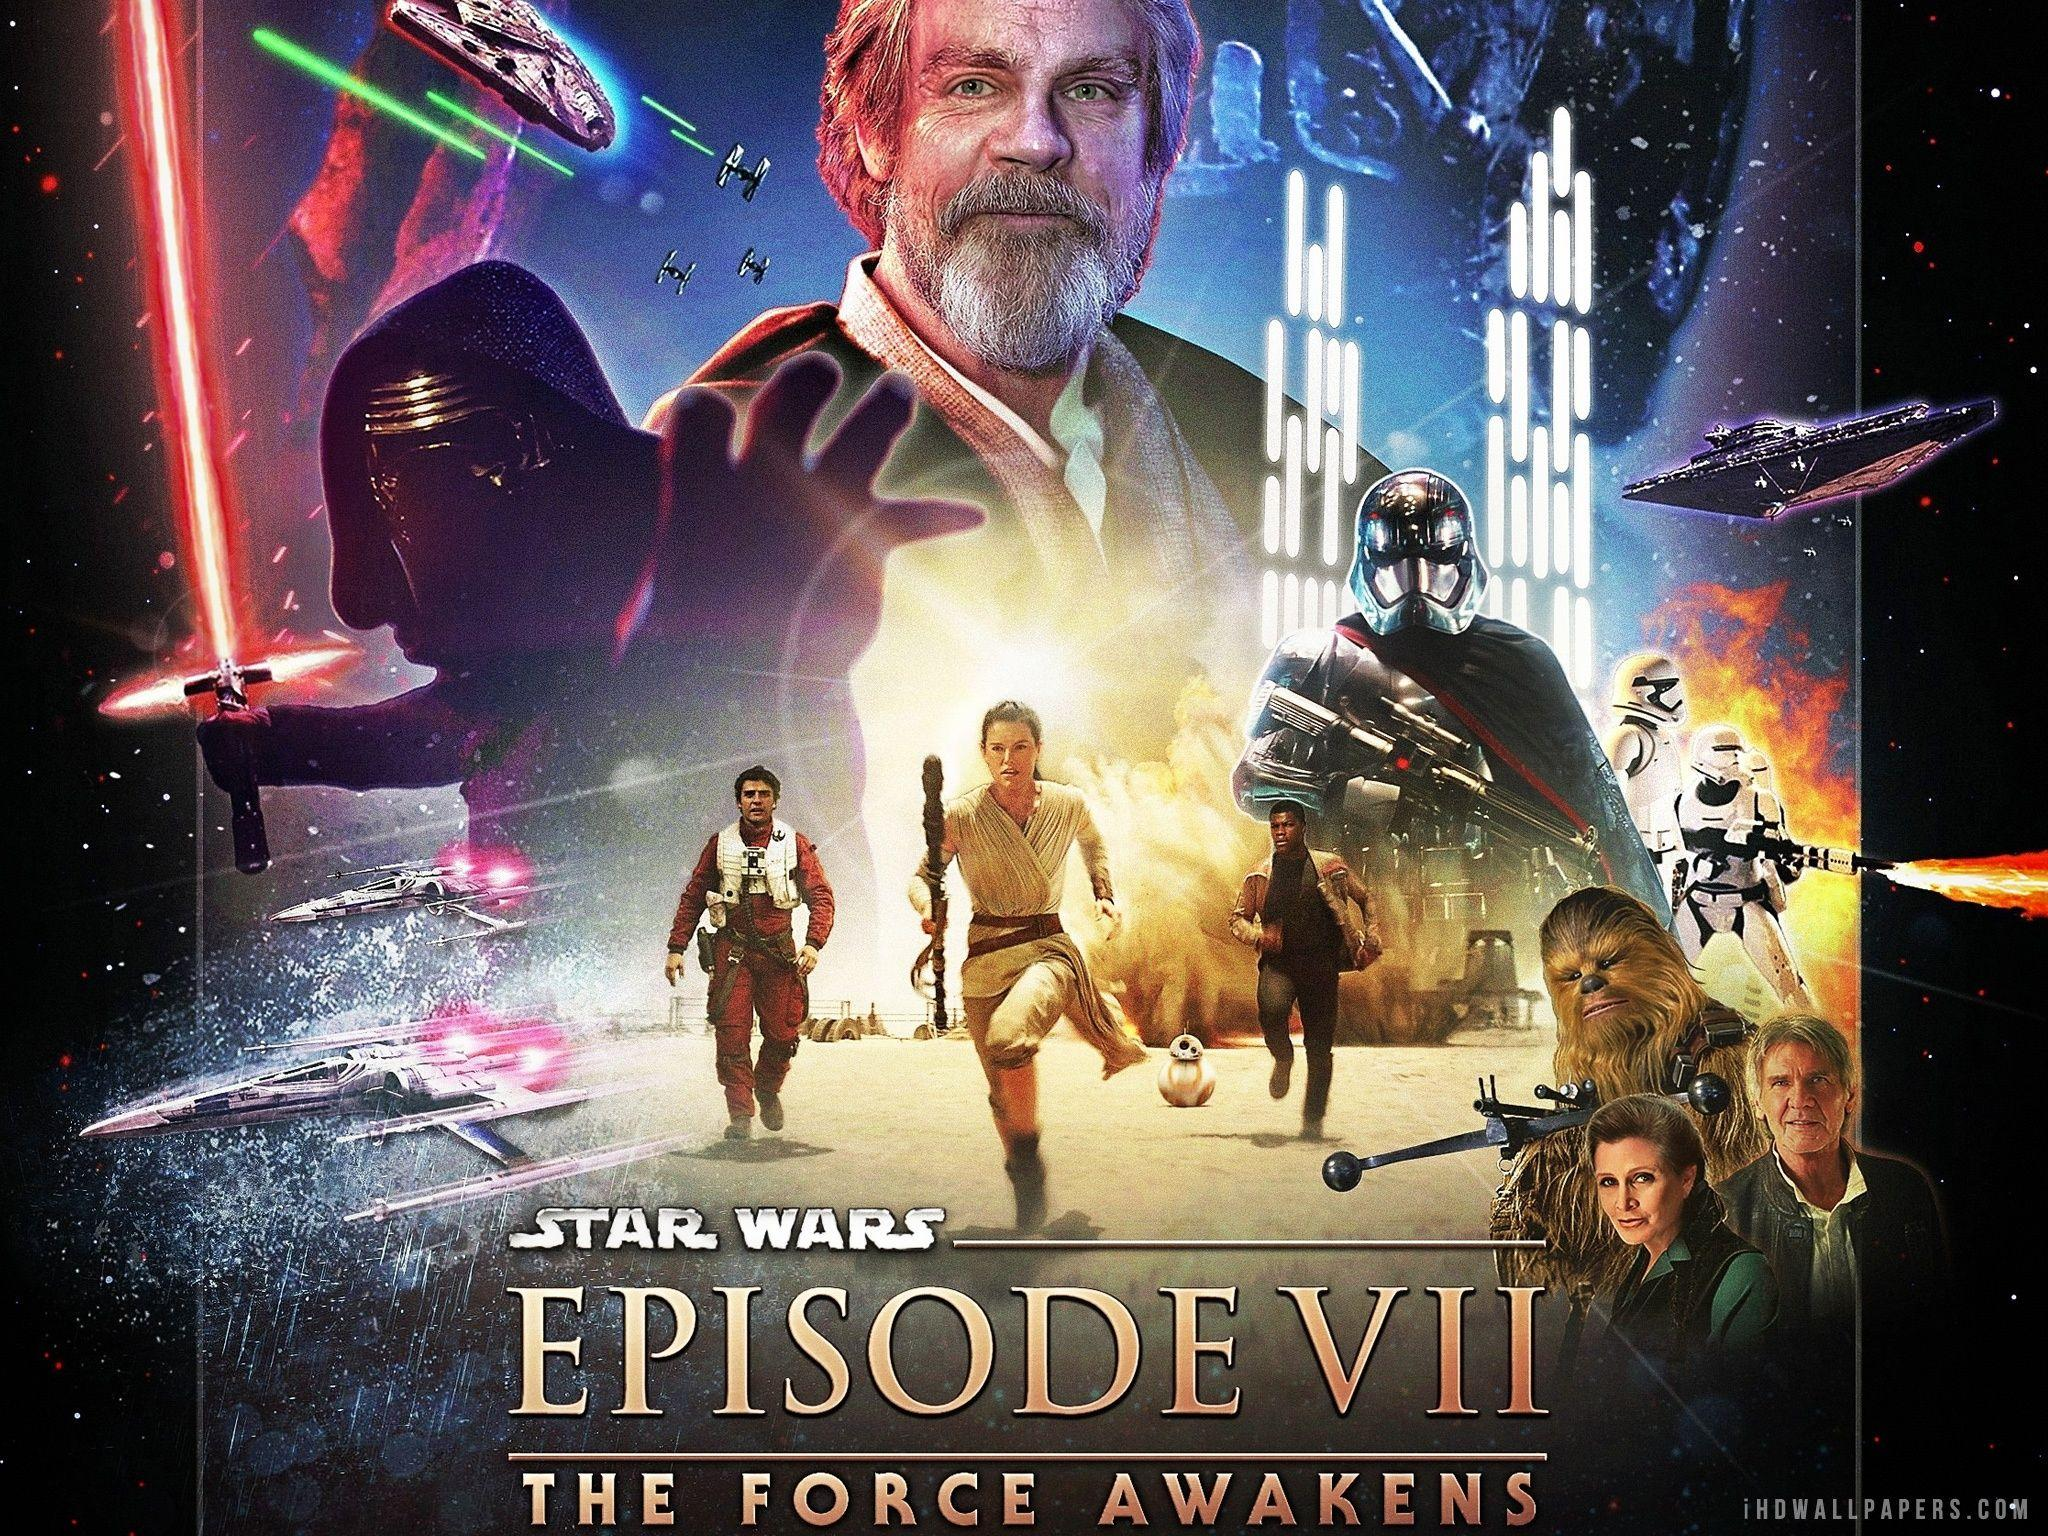 star wars: episode vii wallpapers - wallpaper cave